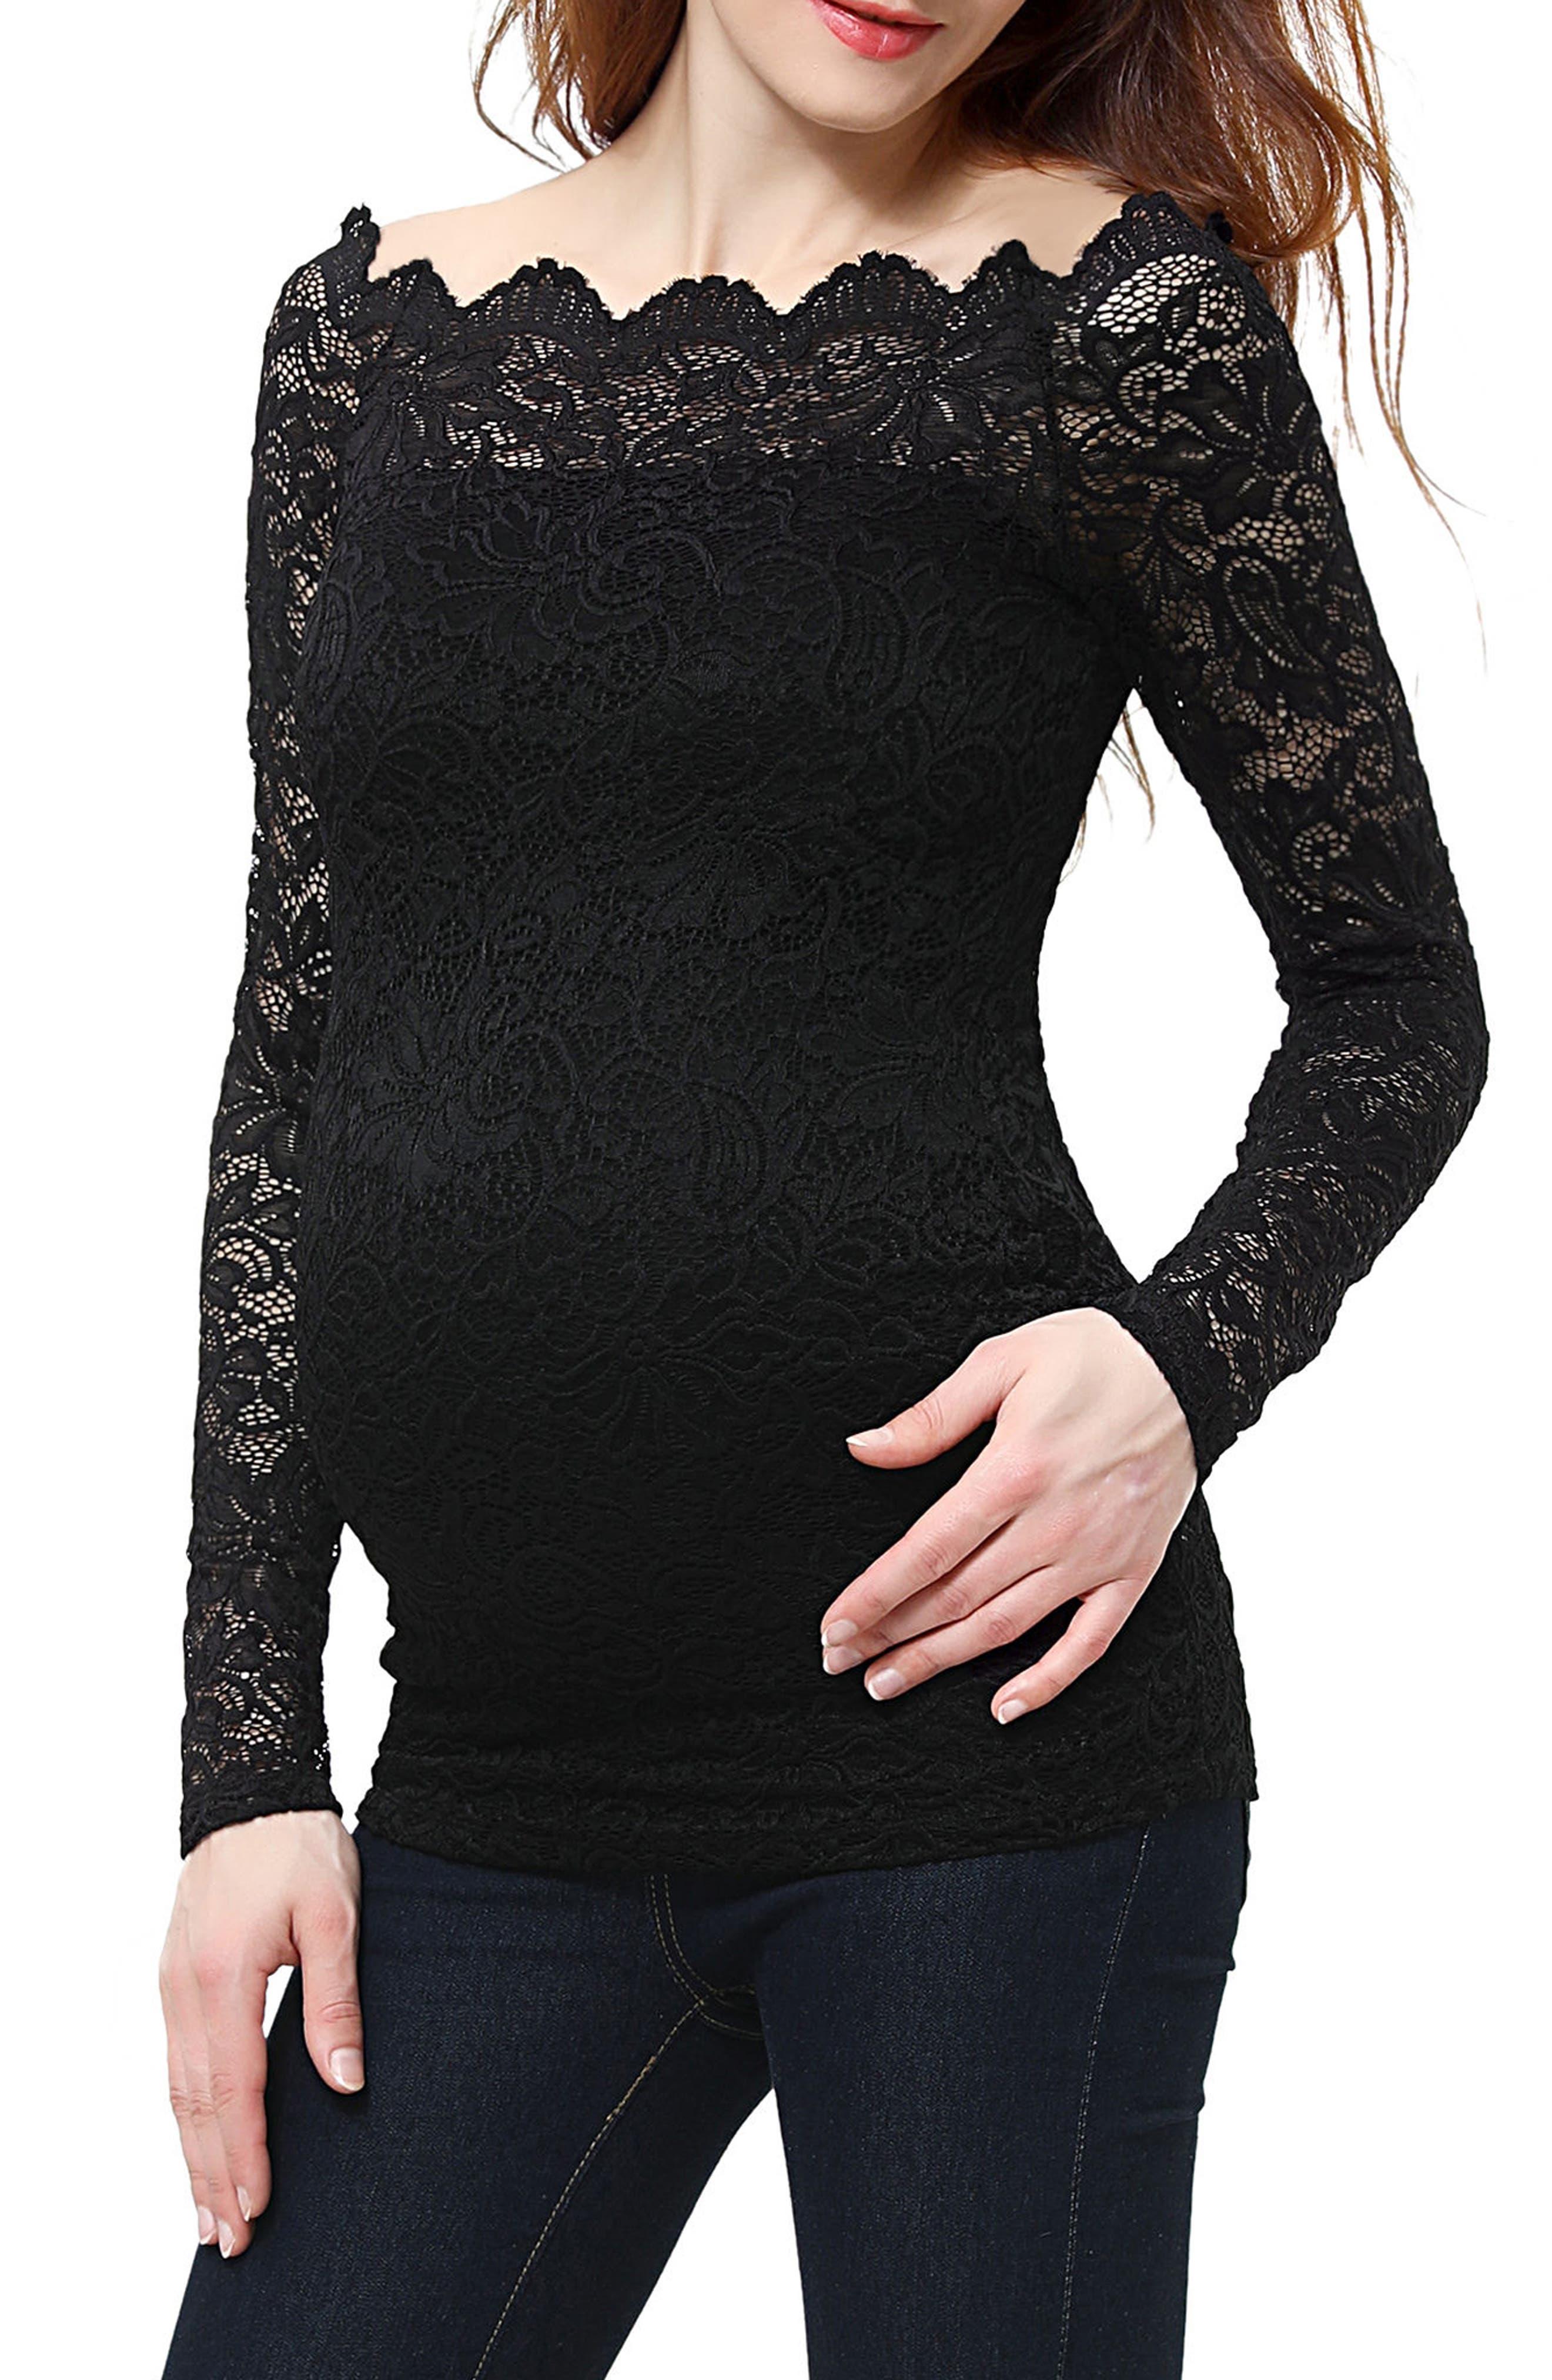 Lace Overlay Maternity Blouse,                             Alternate thumbnail 3, color,                             BLACK